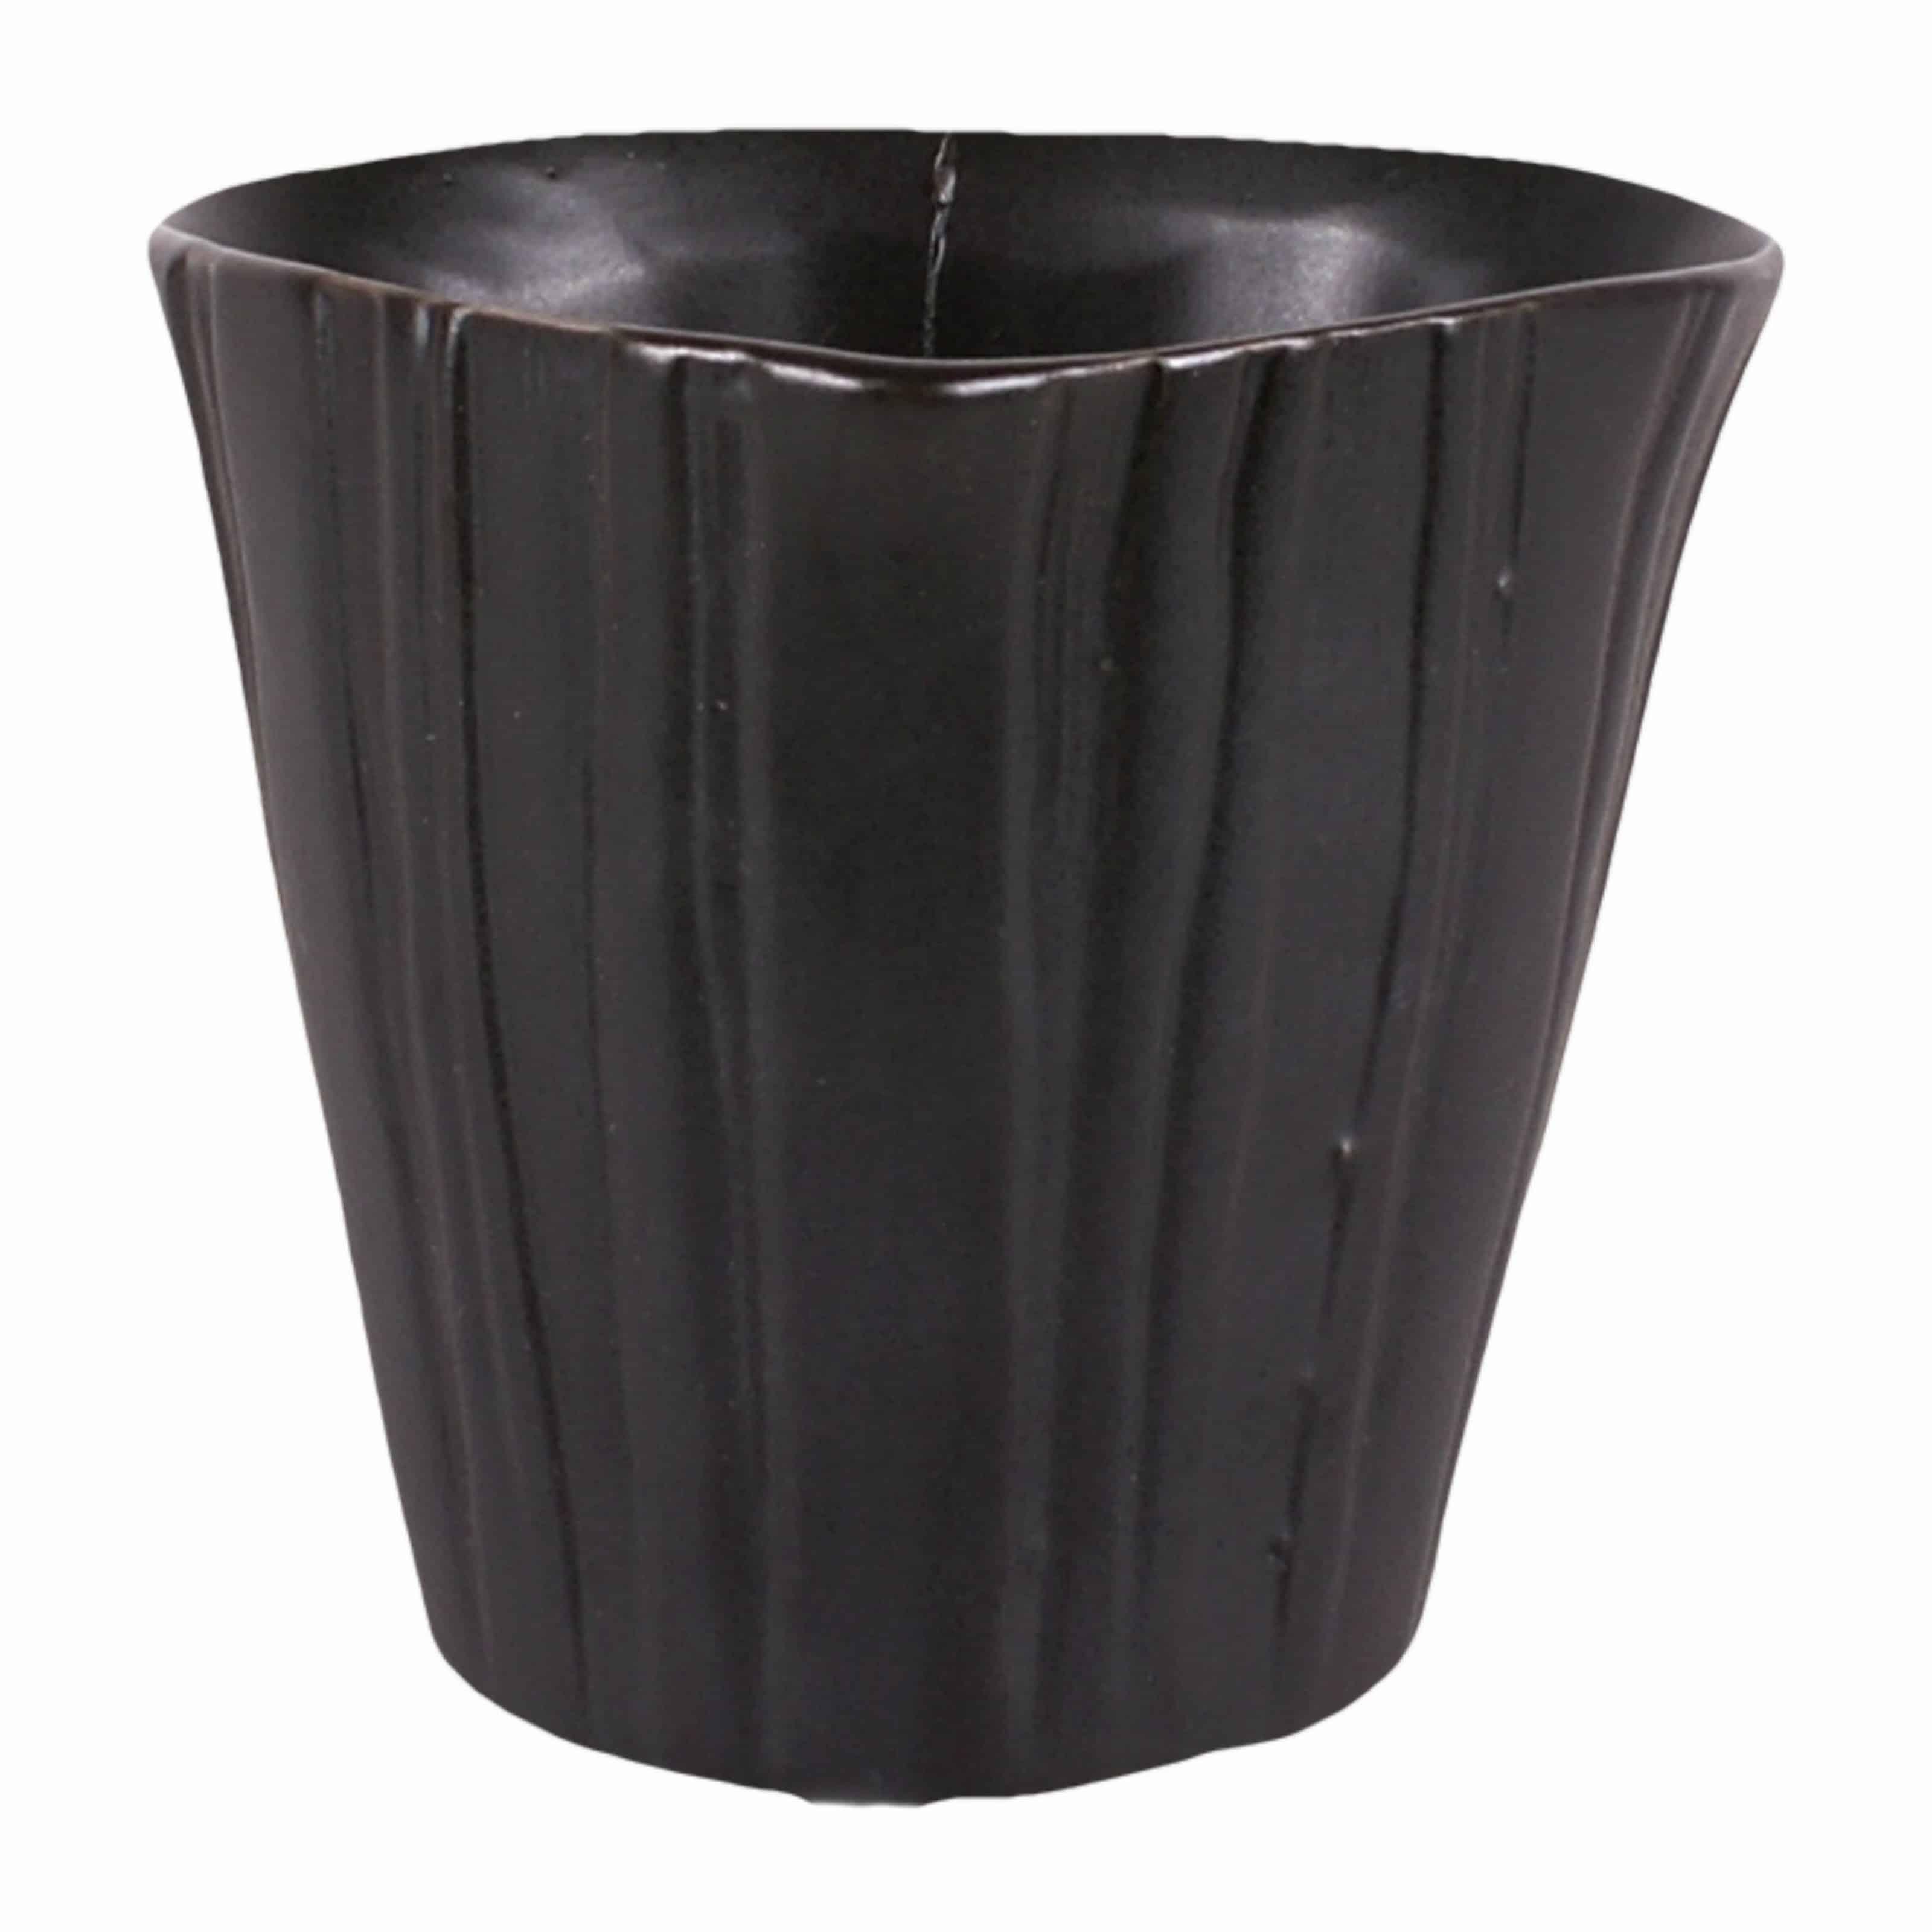 Buy our matt black handmade versatile little plant pot. A favourite for window gardens